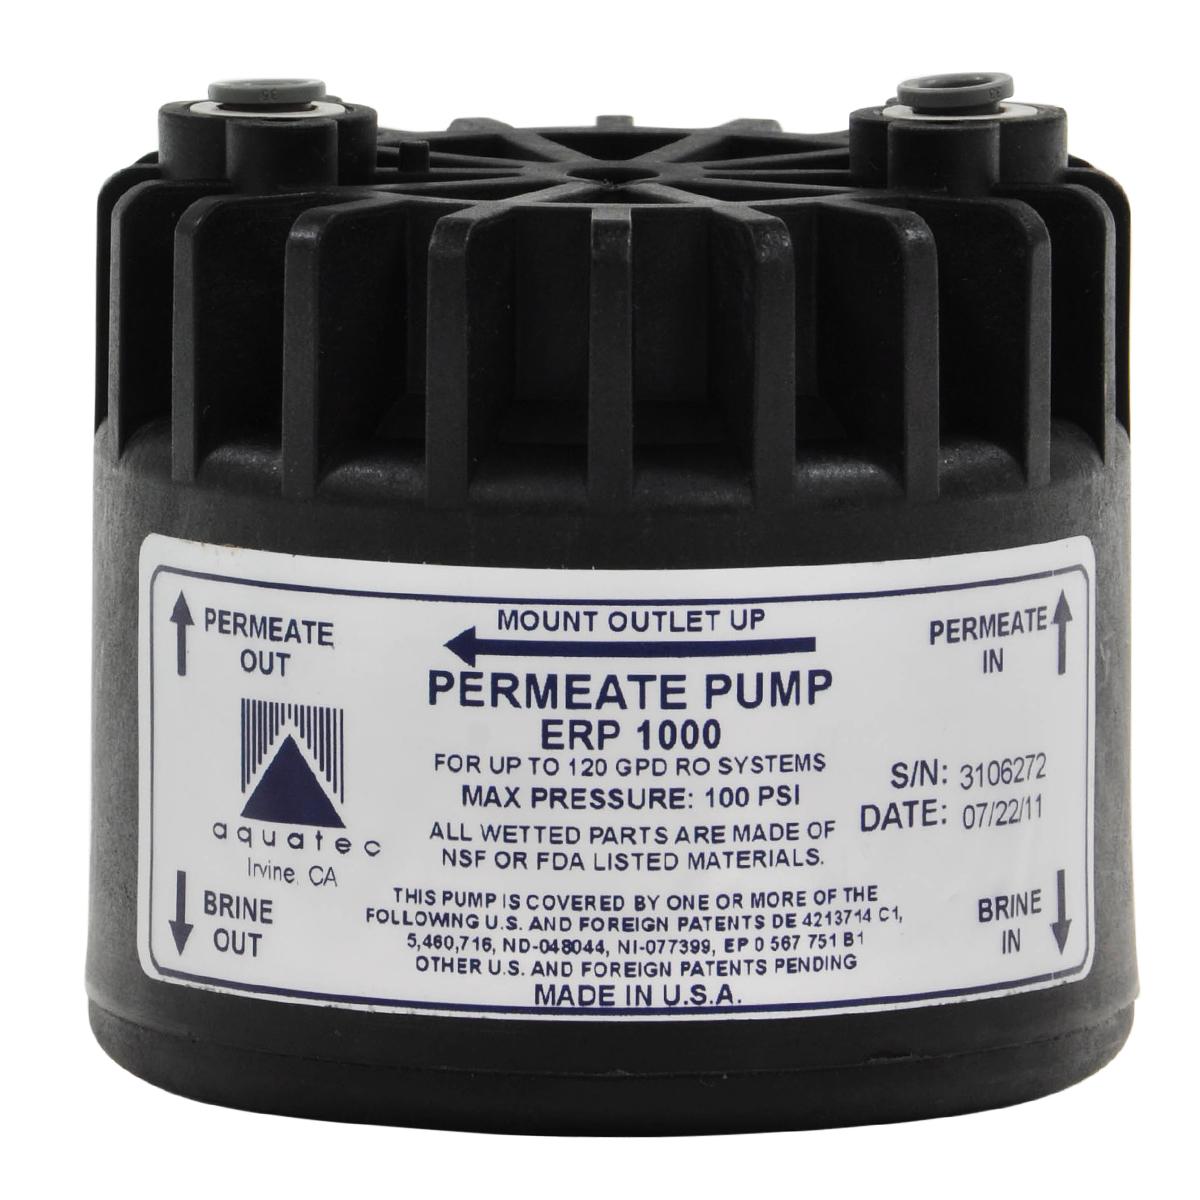 Aquatec Permeate Pump Erp 1000 Bulk Reef Supply